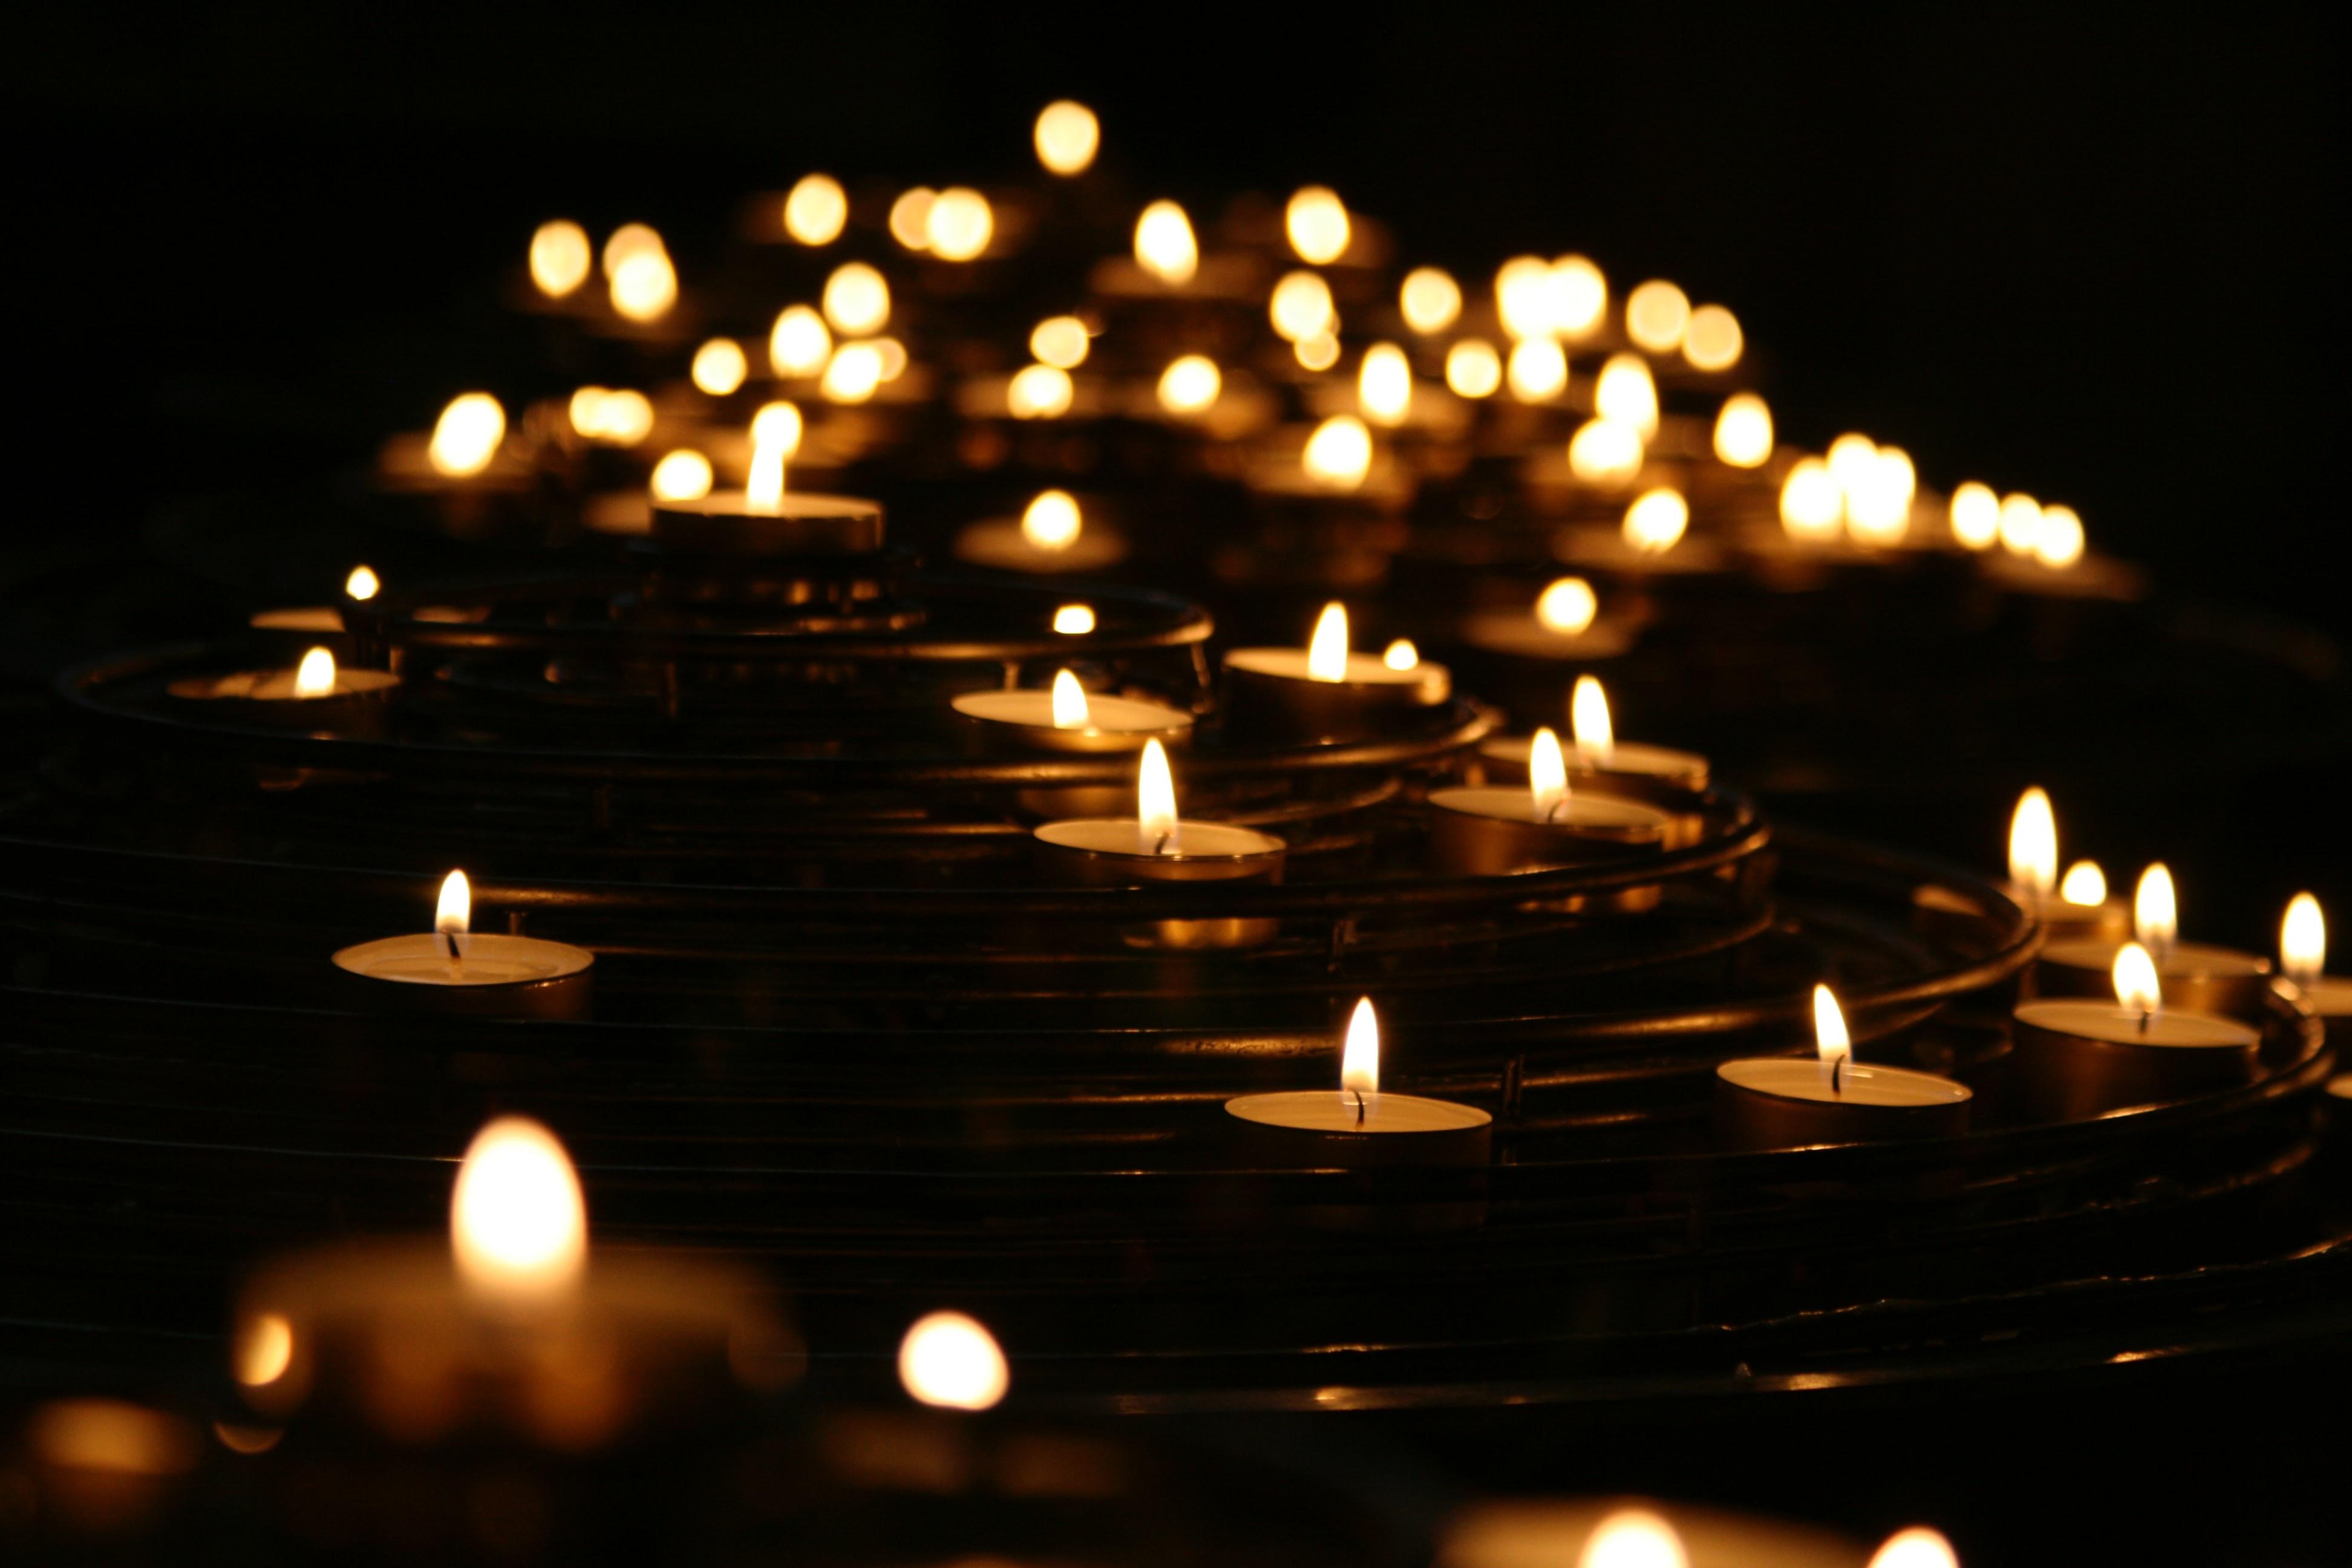 Bereavement through suicide